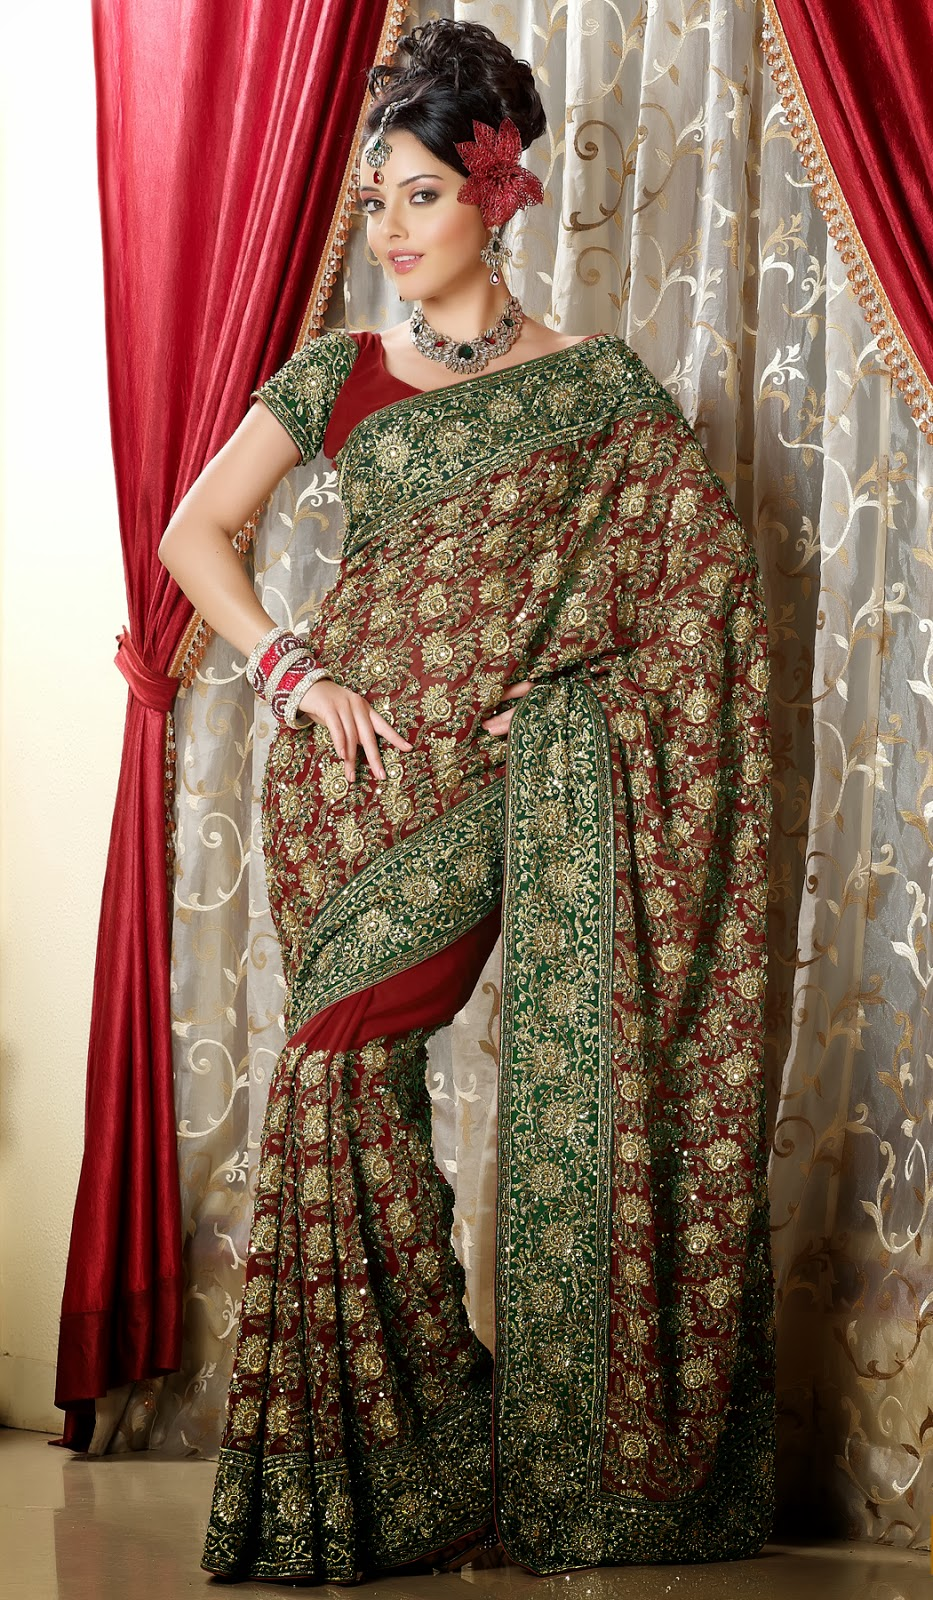 Indian Desi Females In Saree Full Hd  Photo Chocolate-8779